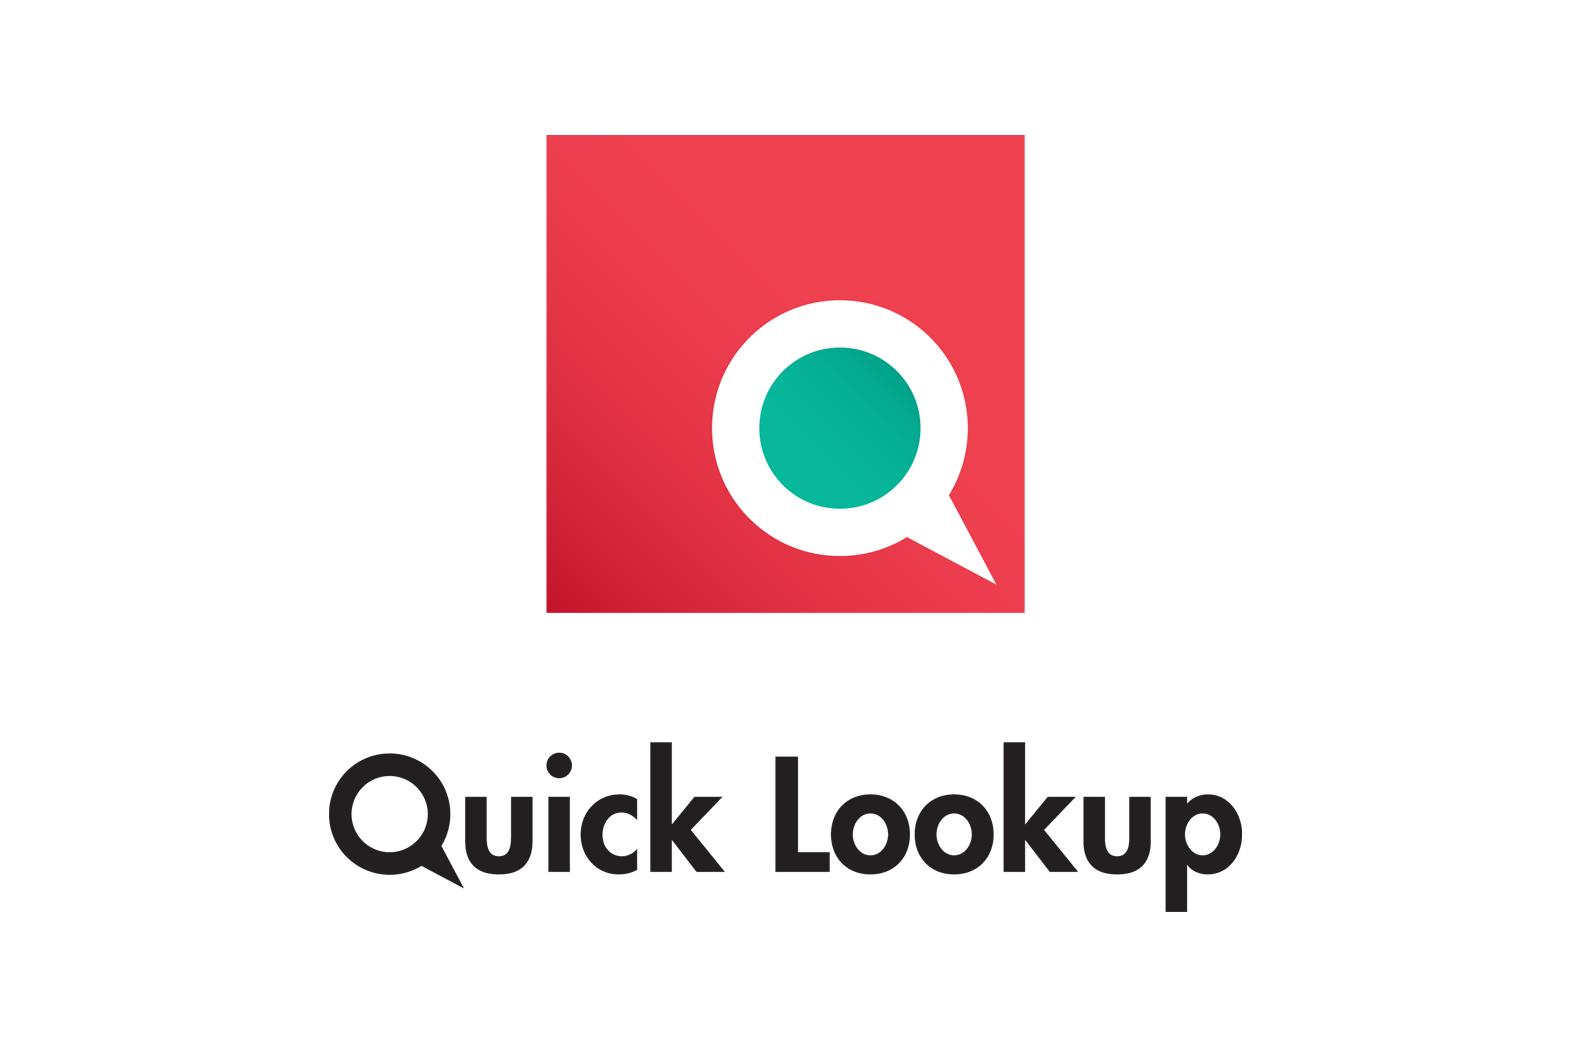 Quick Lookup